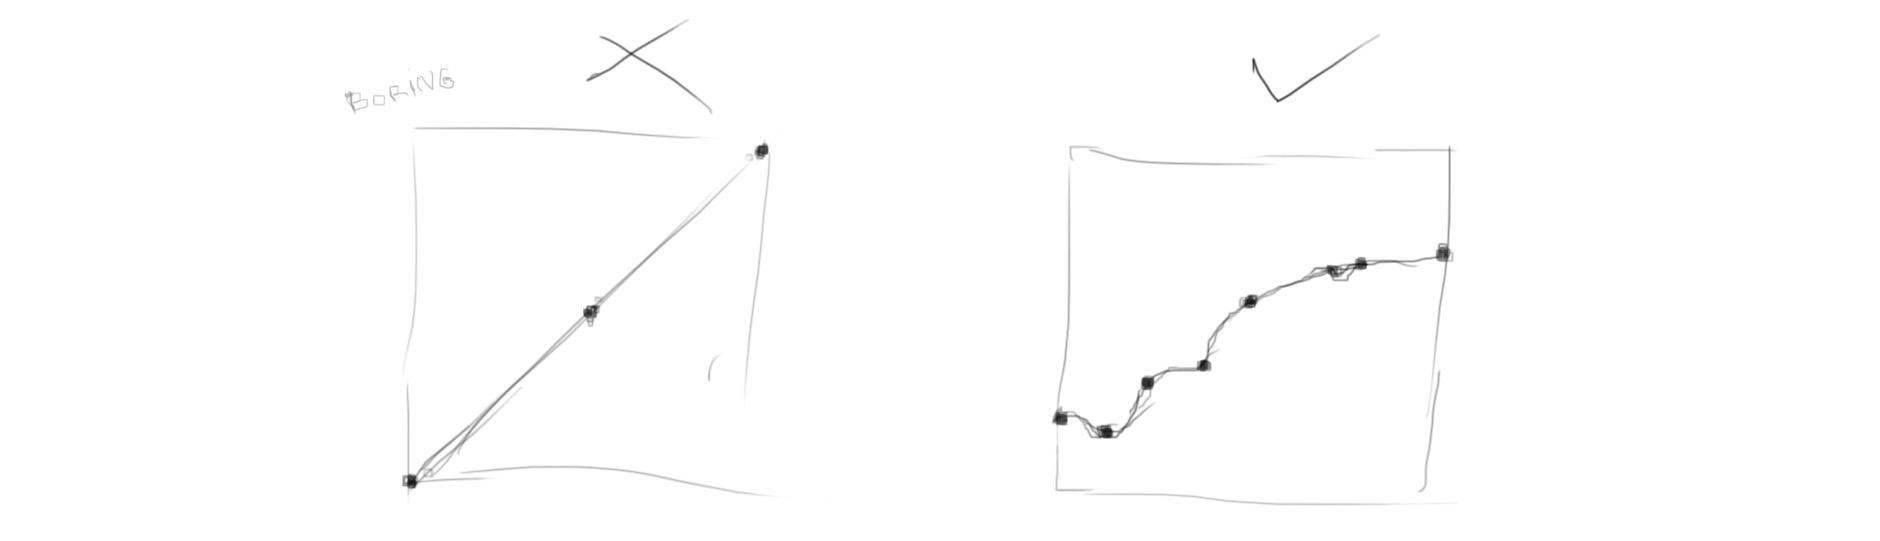 blender tutorial film emulation